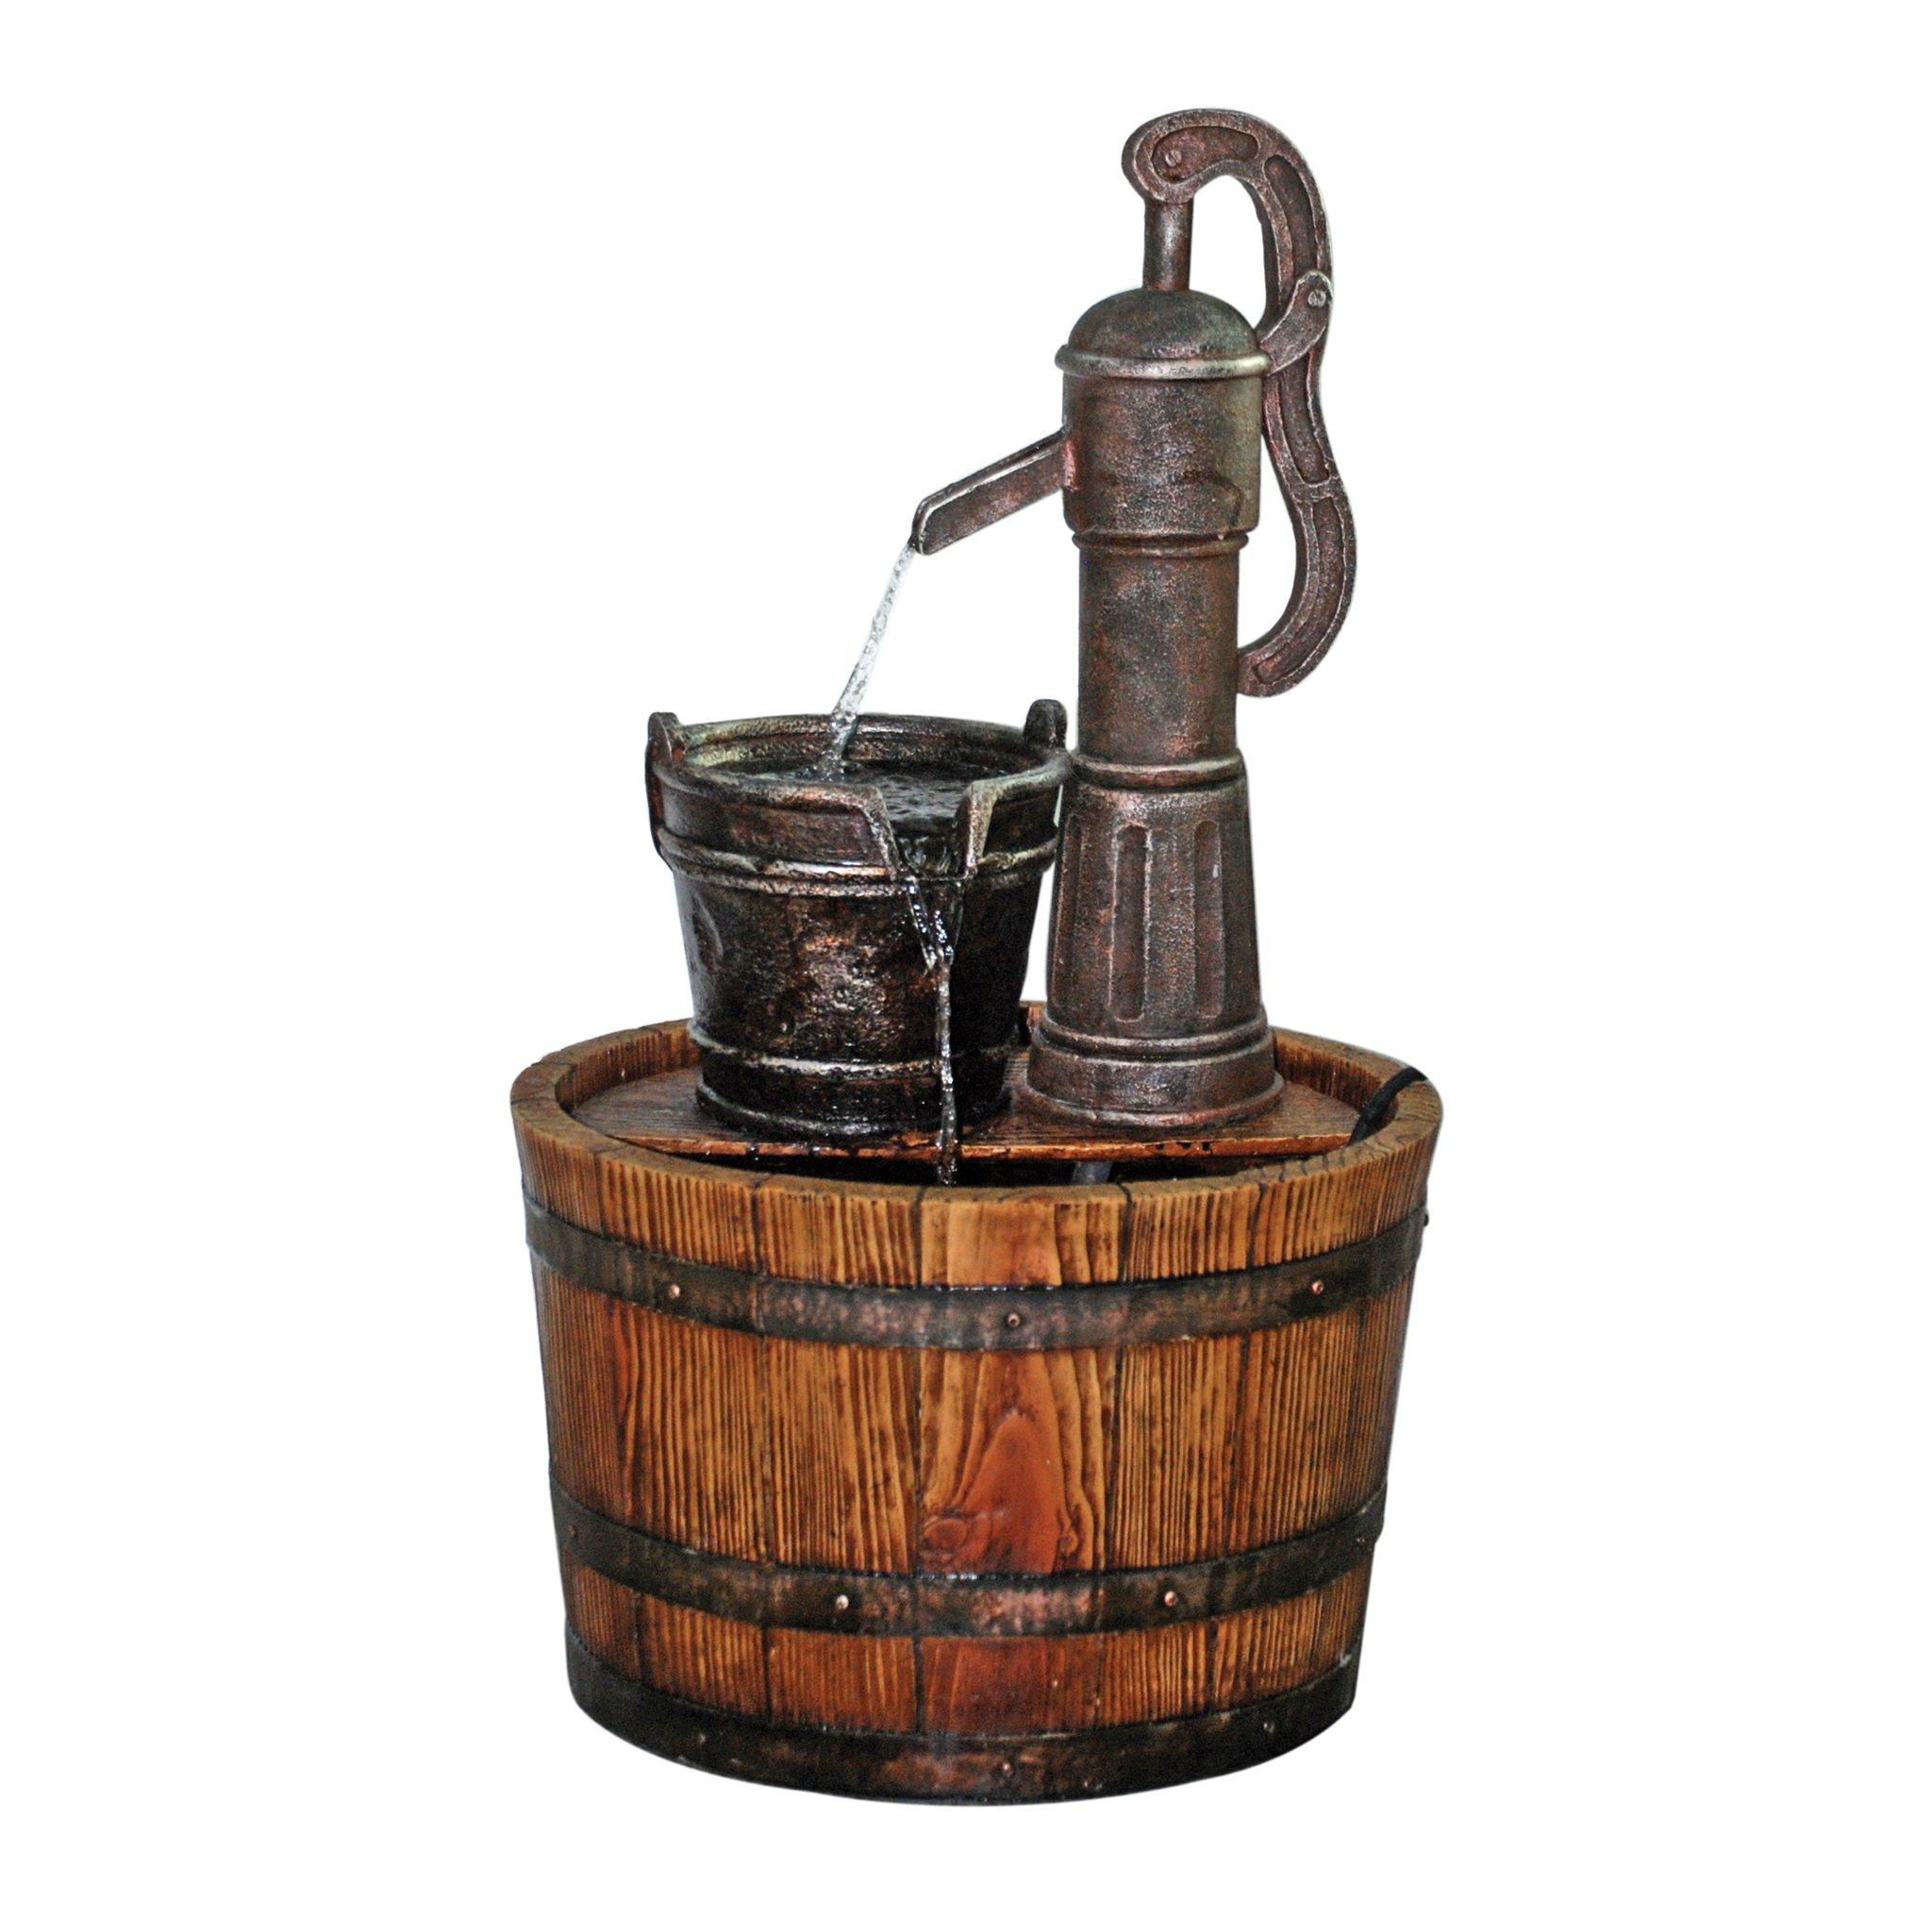 Water Fountain - Cistern Well Pump Wood Barrel Garden Decor Fountain - Outdoor Water Feature